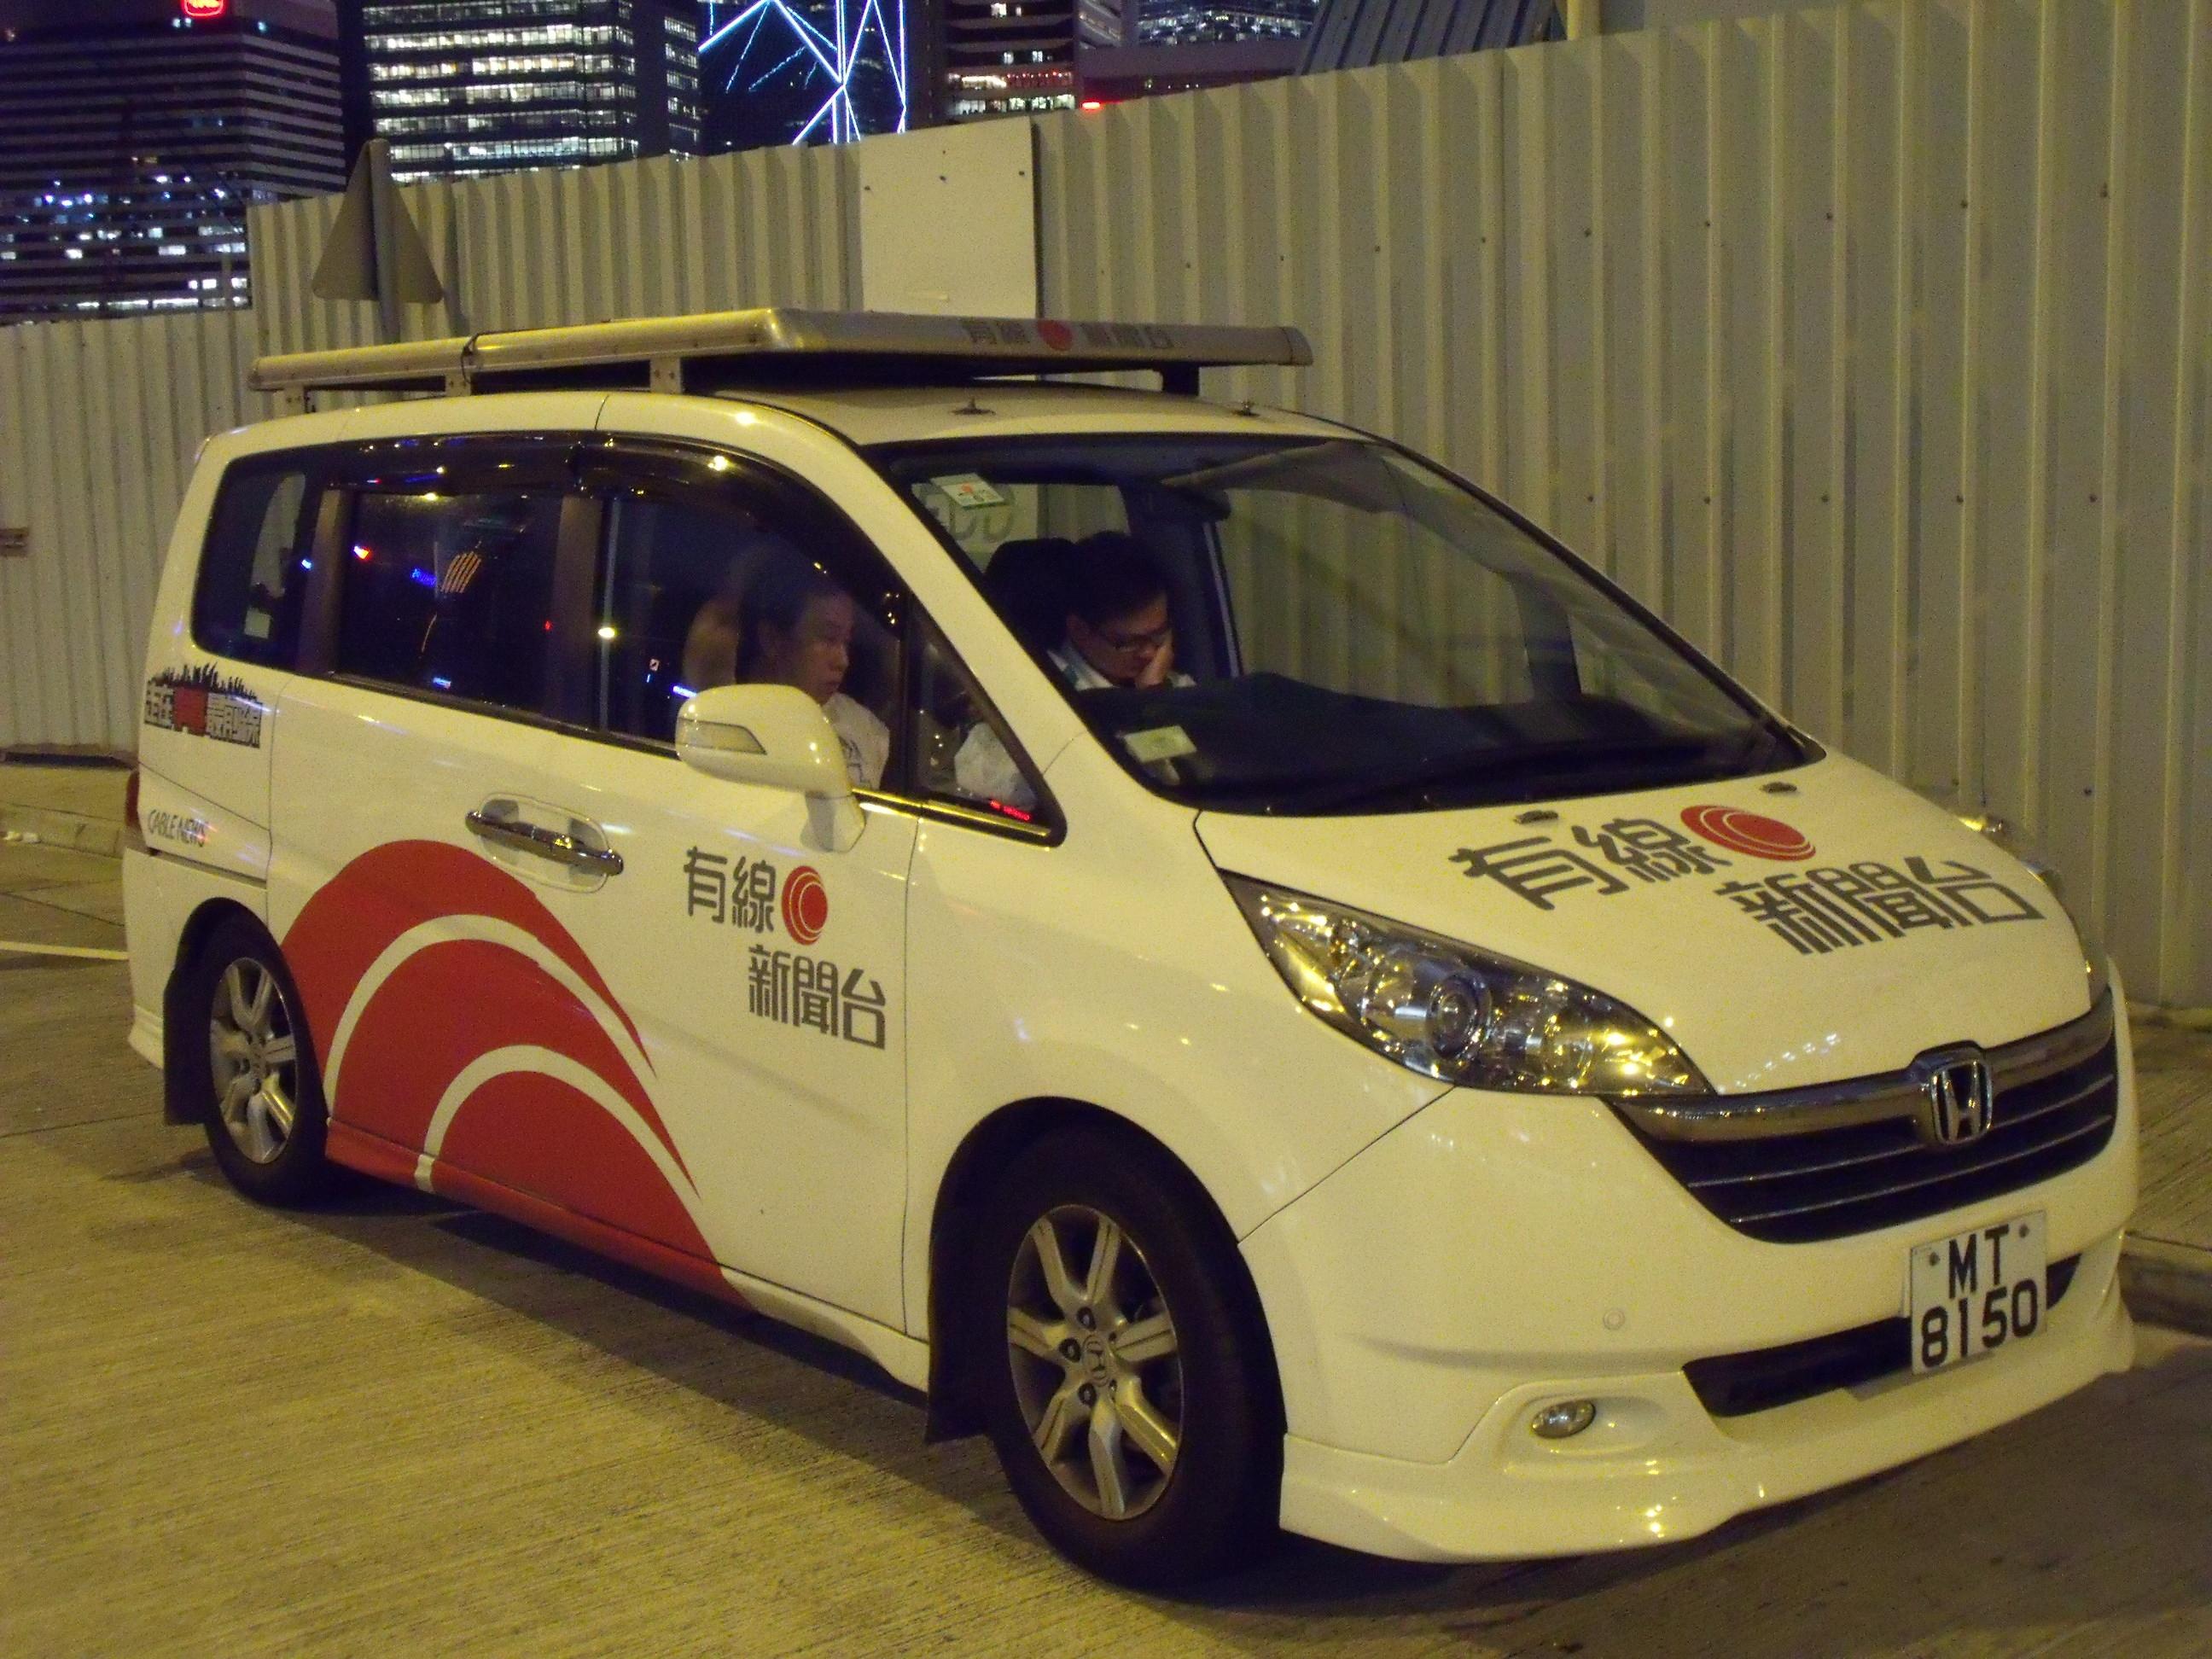 file:hong kong cable tv news car mt8150 20090808 - wikimedia commons